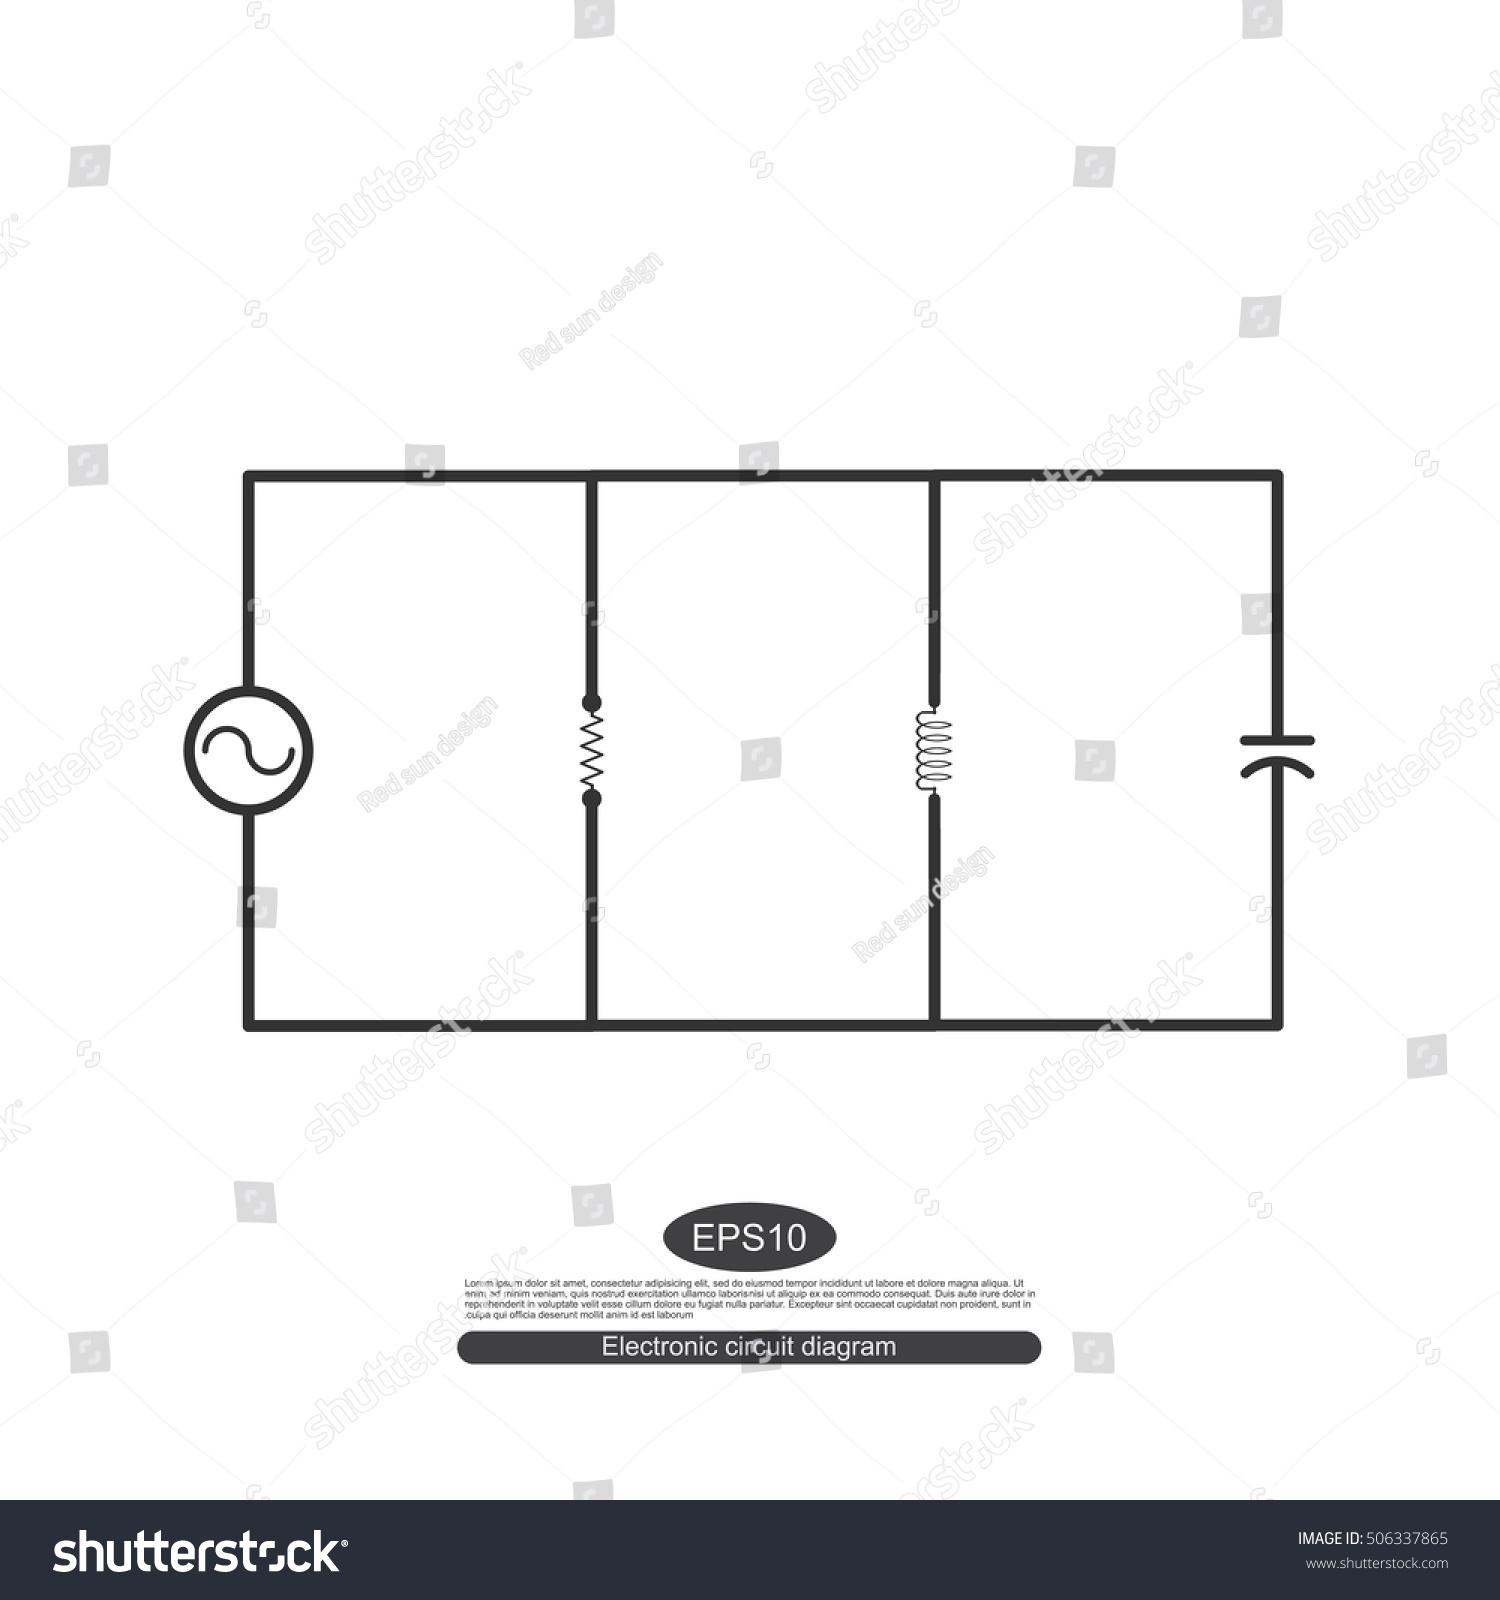 Gs400 Engine Diagram Circuit Wiring And Hub Lexus Ls400 Swap Belt 1998 Es 300